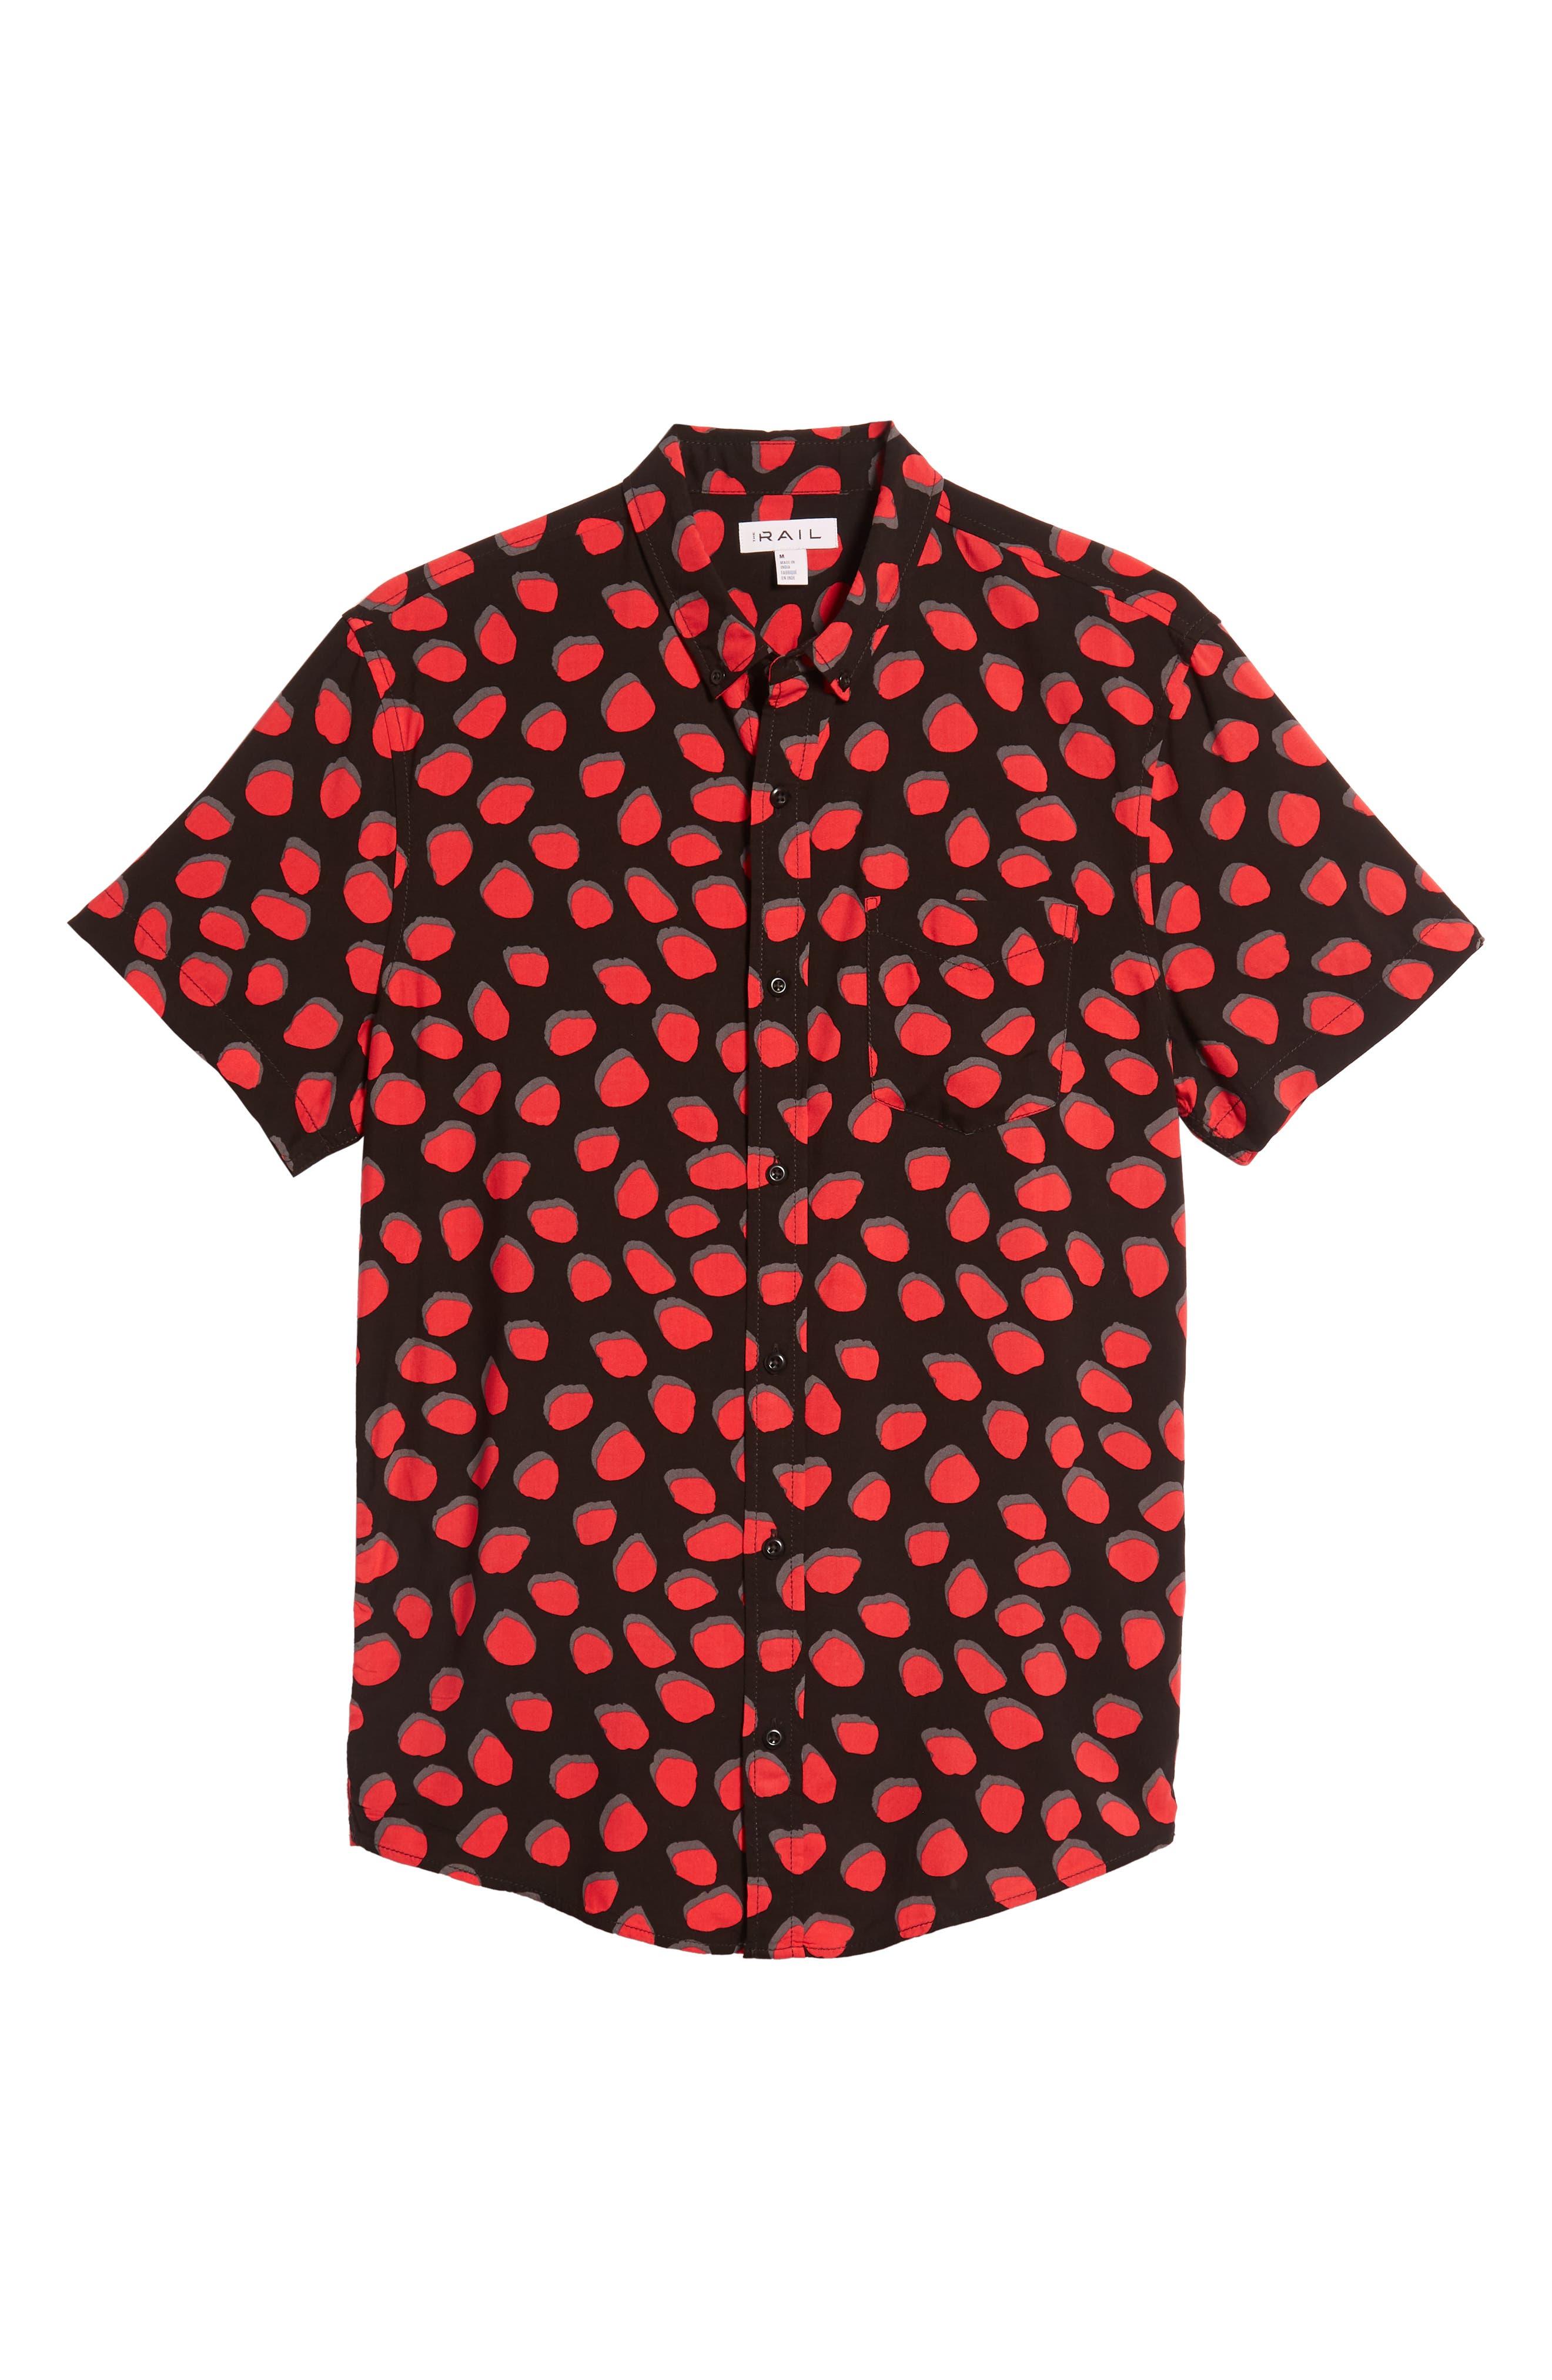 Dot Print Woven Shirt,                             Alternate thumbnail 6, color,                             BLACK CORAL INKY DOTS